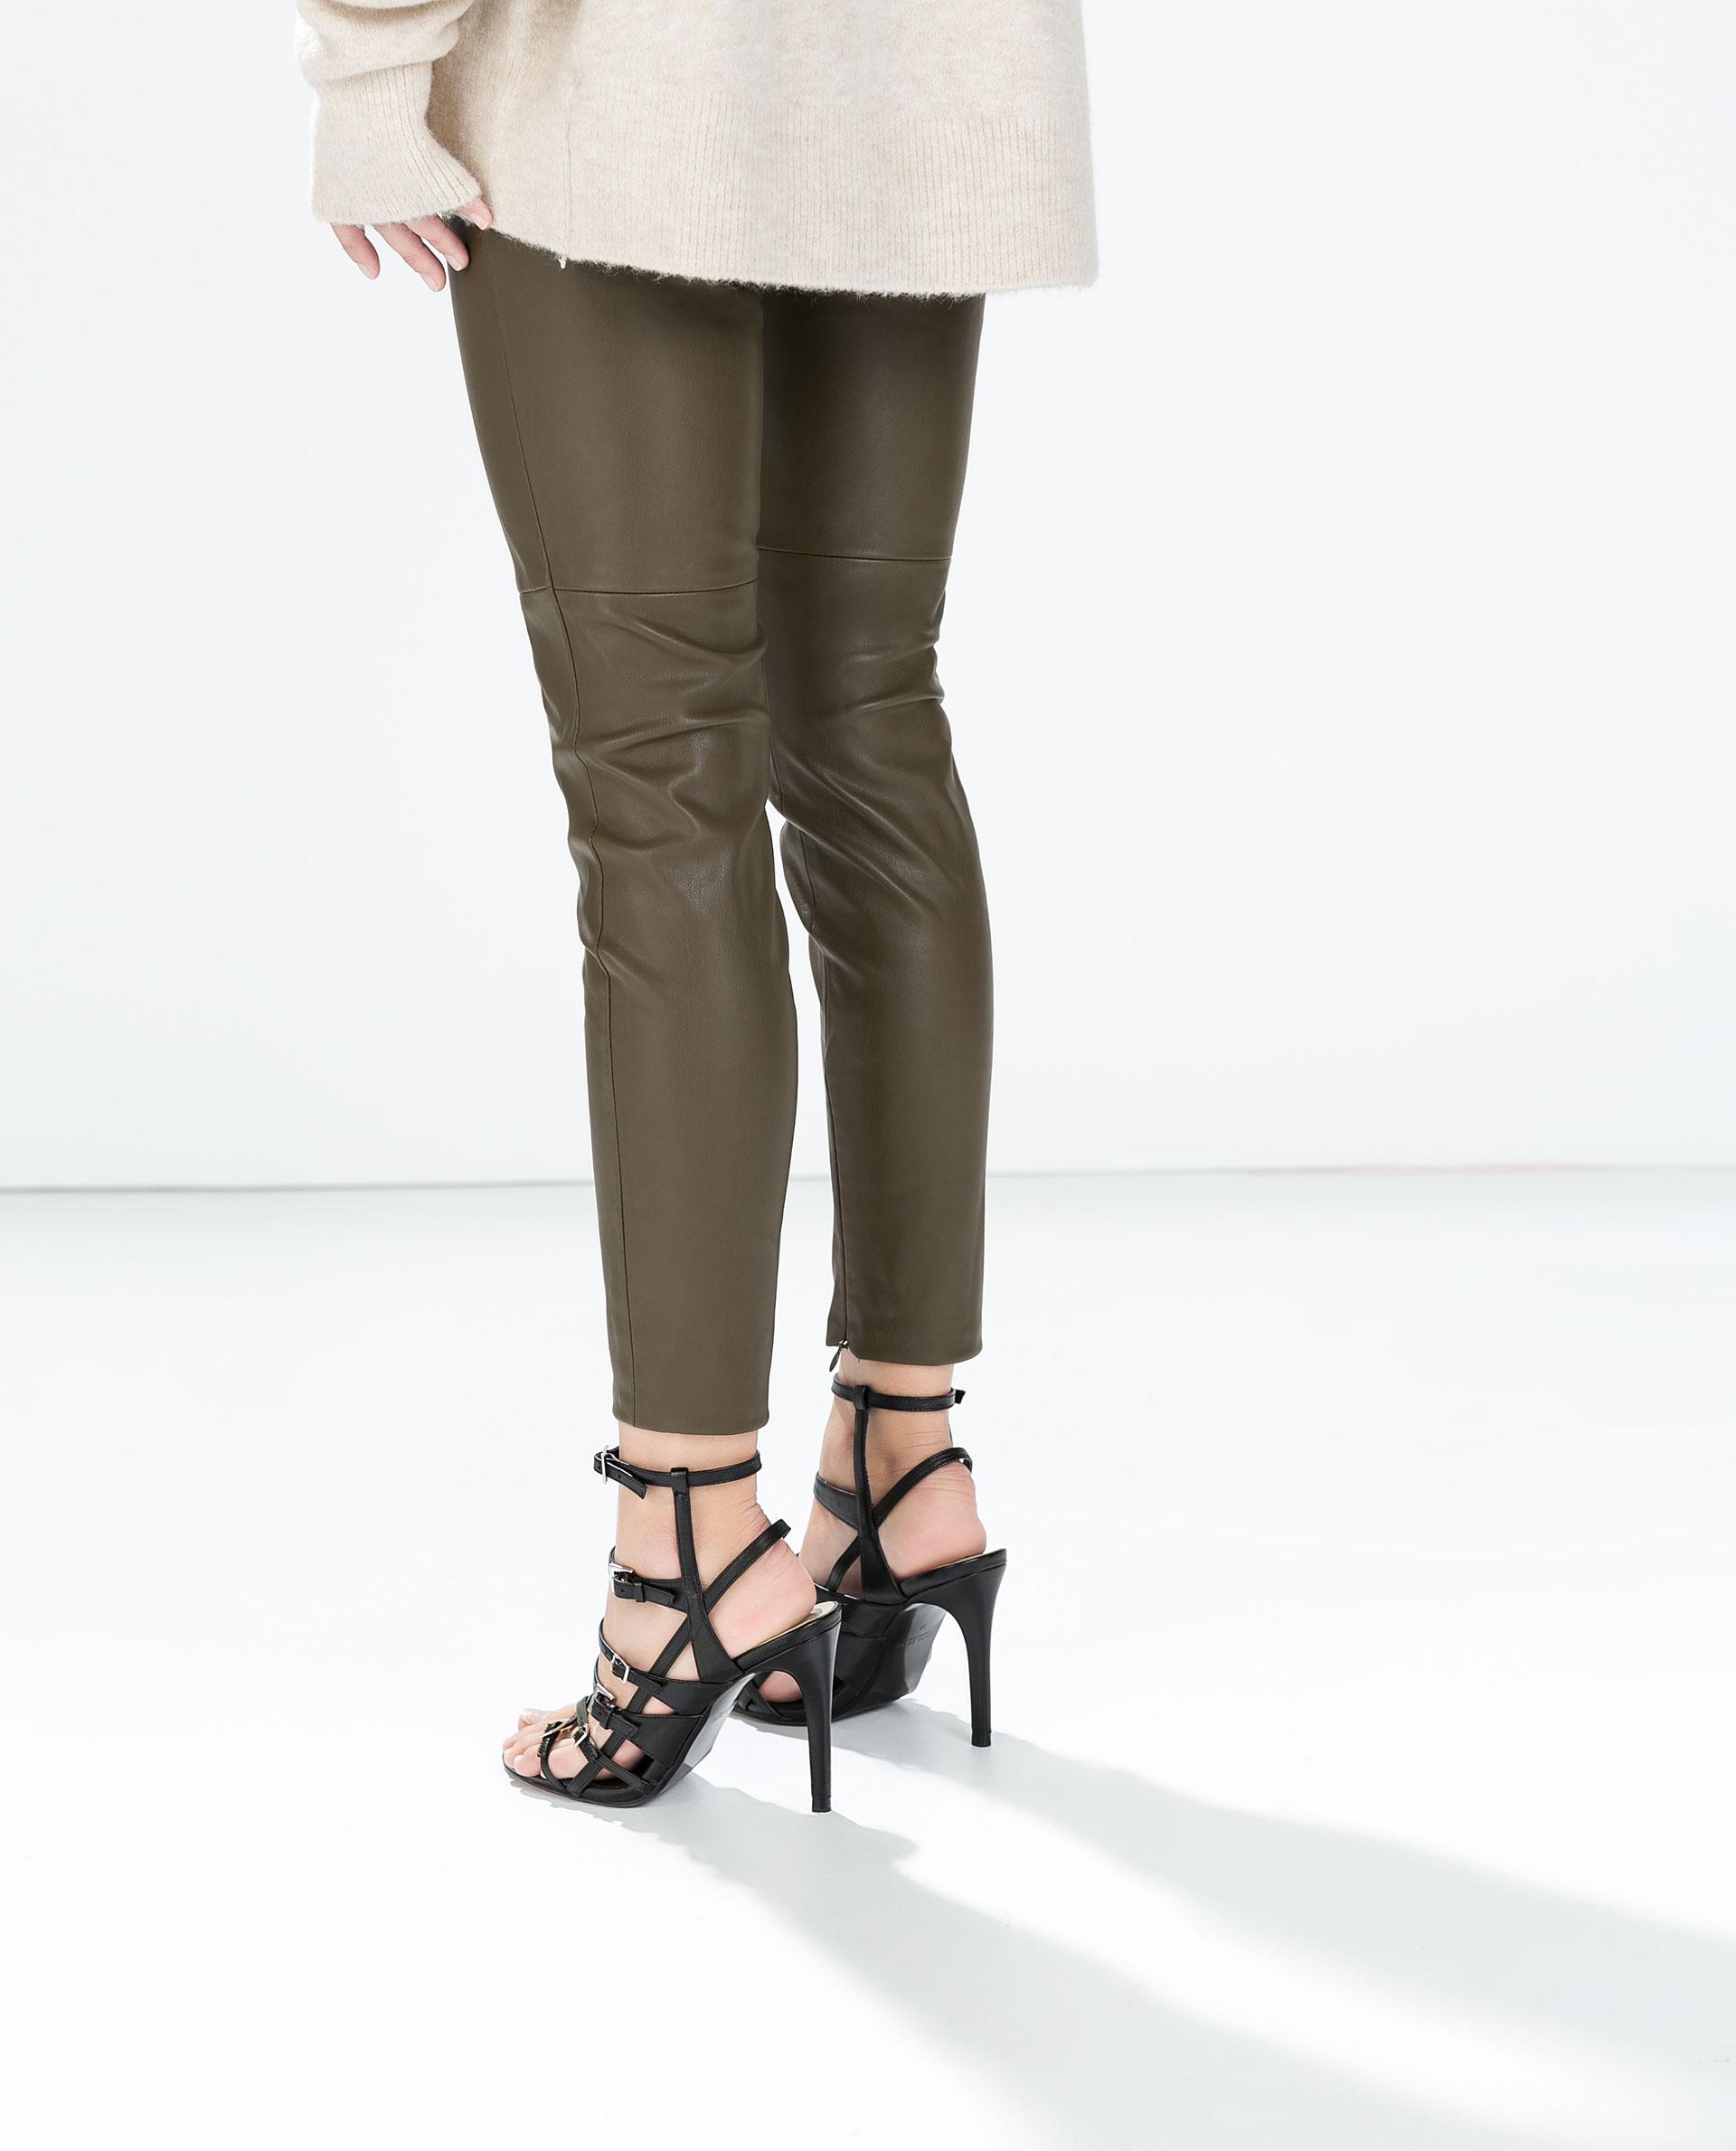 Legging Mujer Ss15 Polipiel Pantalones Rodilla Corte Colección htsxQrdCB